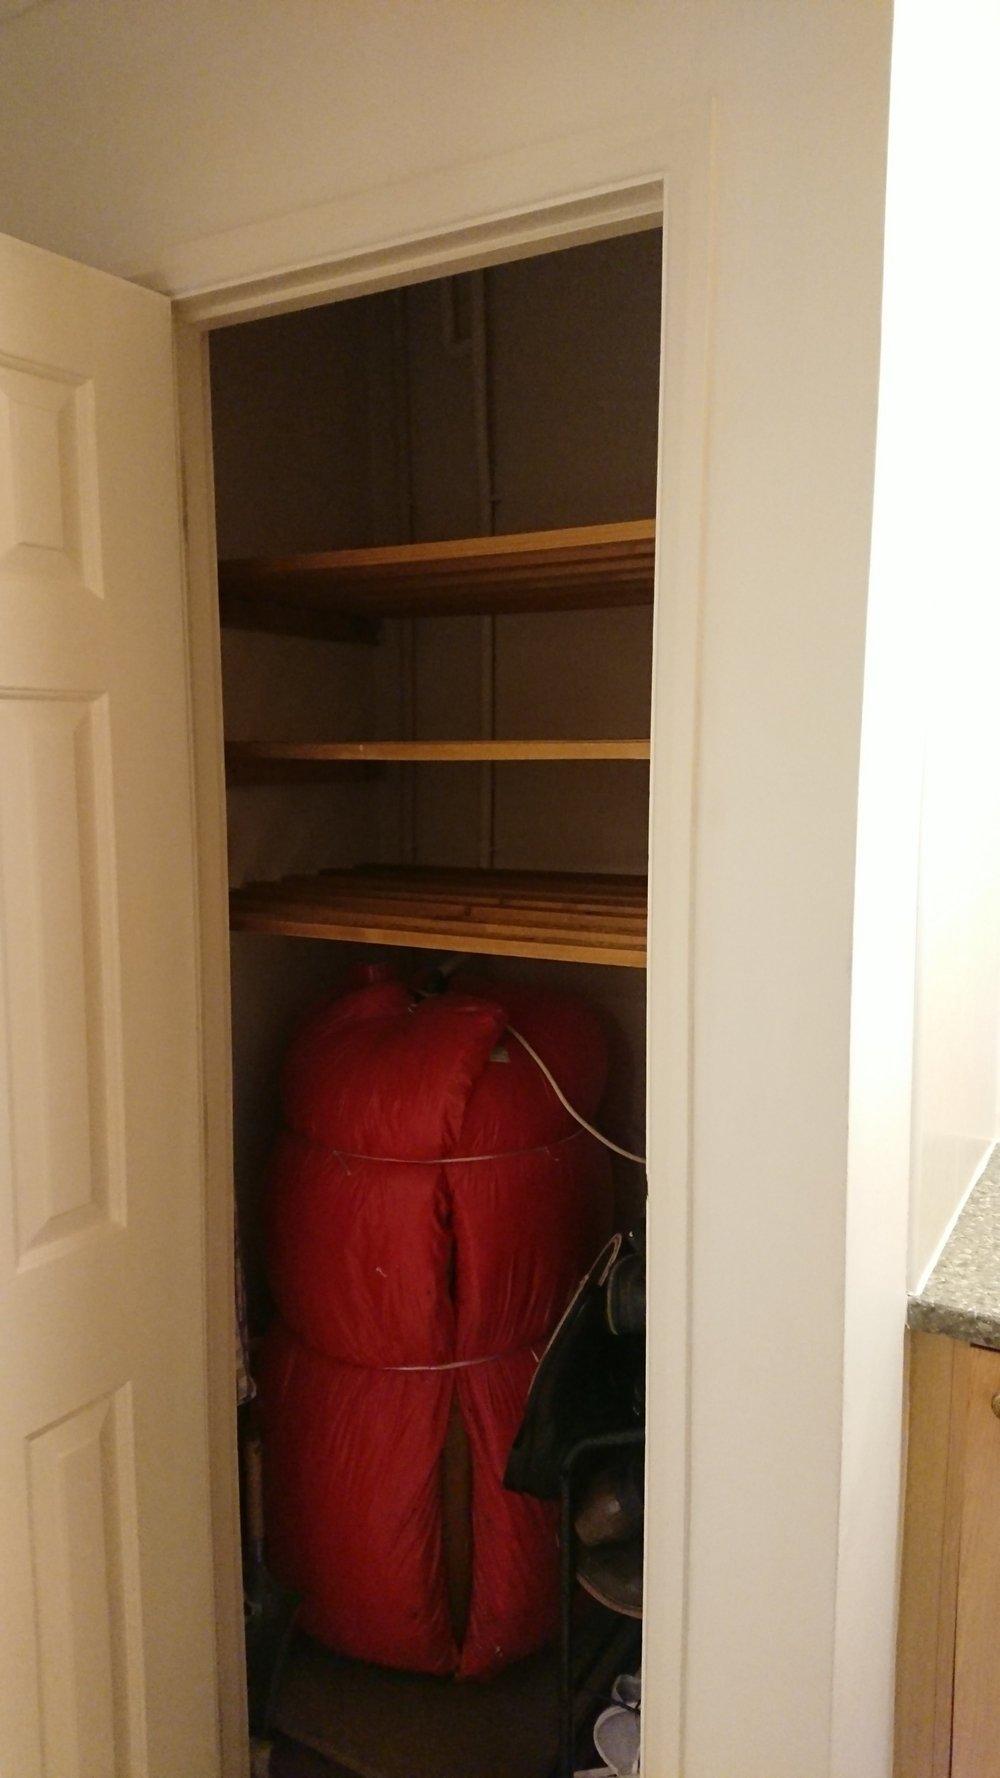 Before airing cupboard